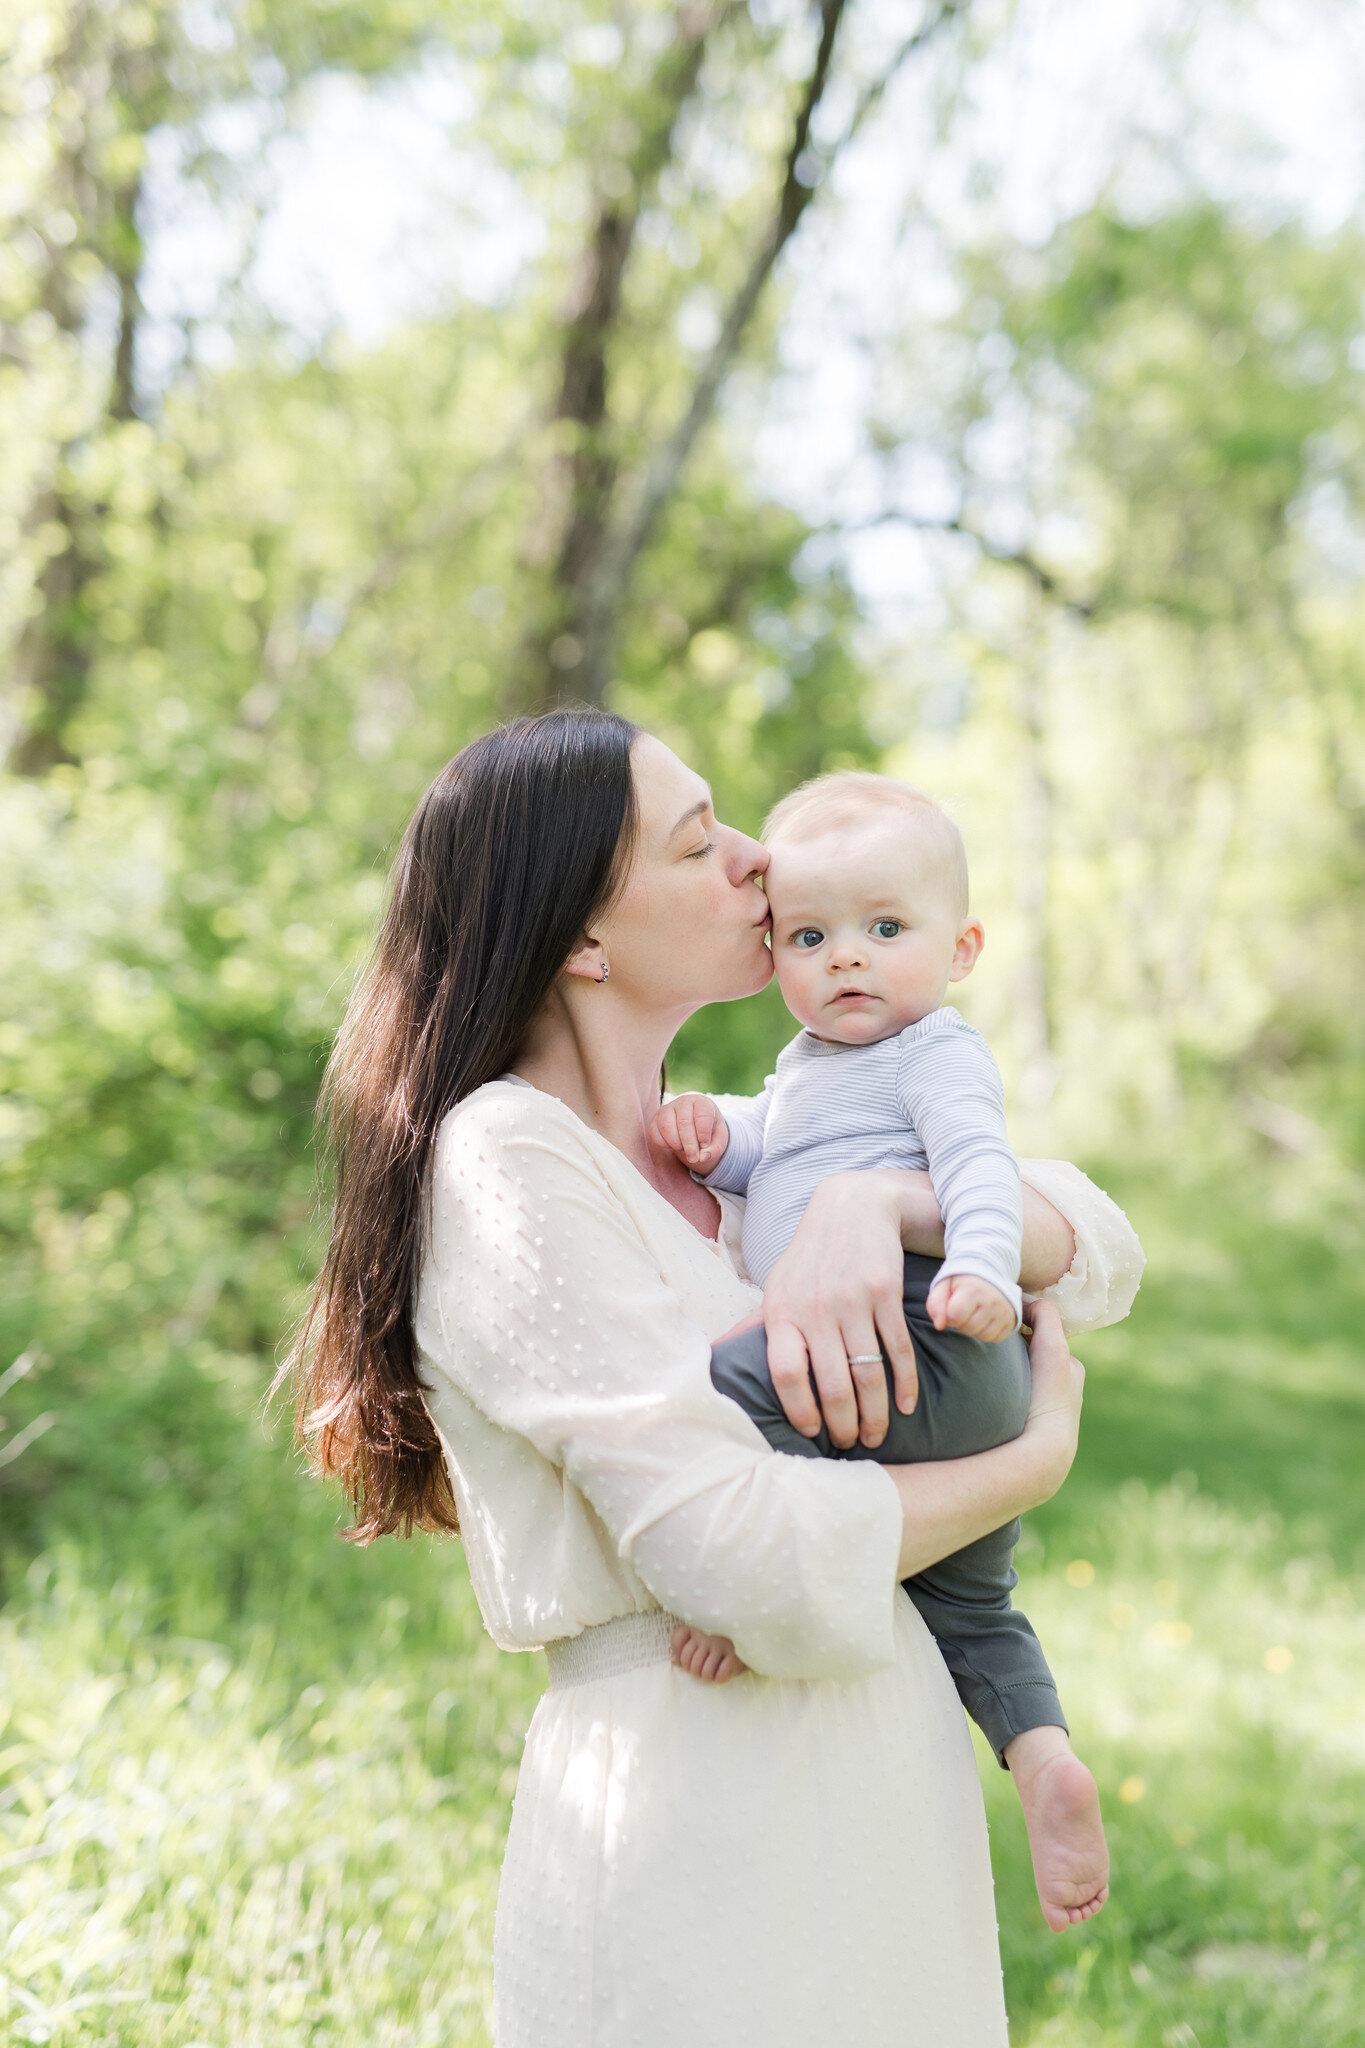 ct motherhood session_motherhood story CT_motherhood photographcer CT_7.jpg